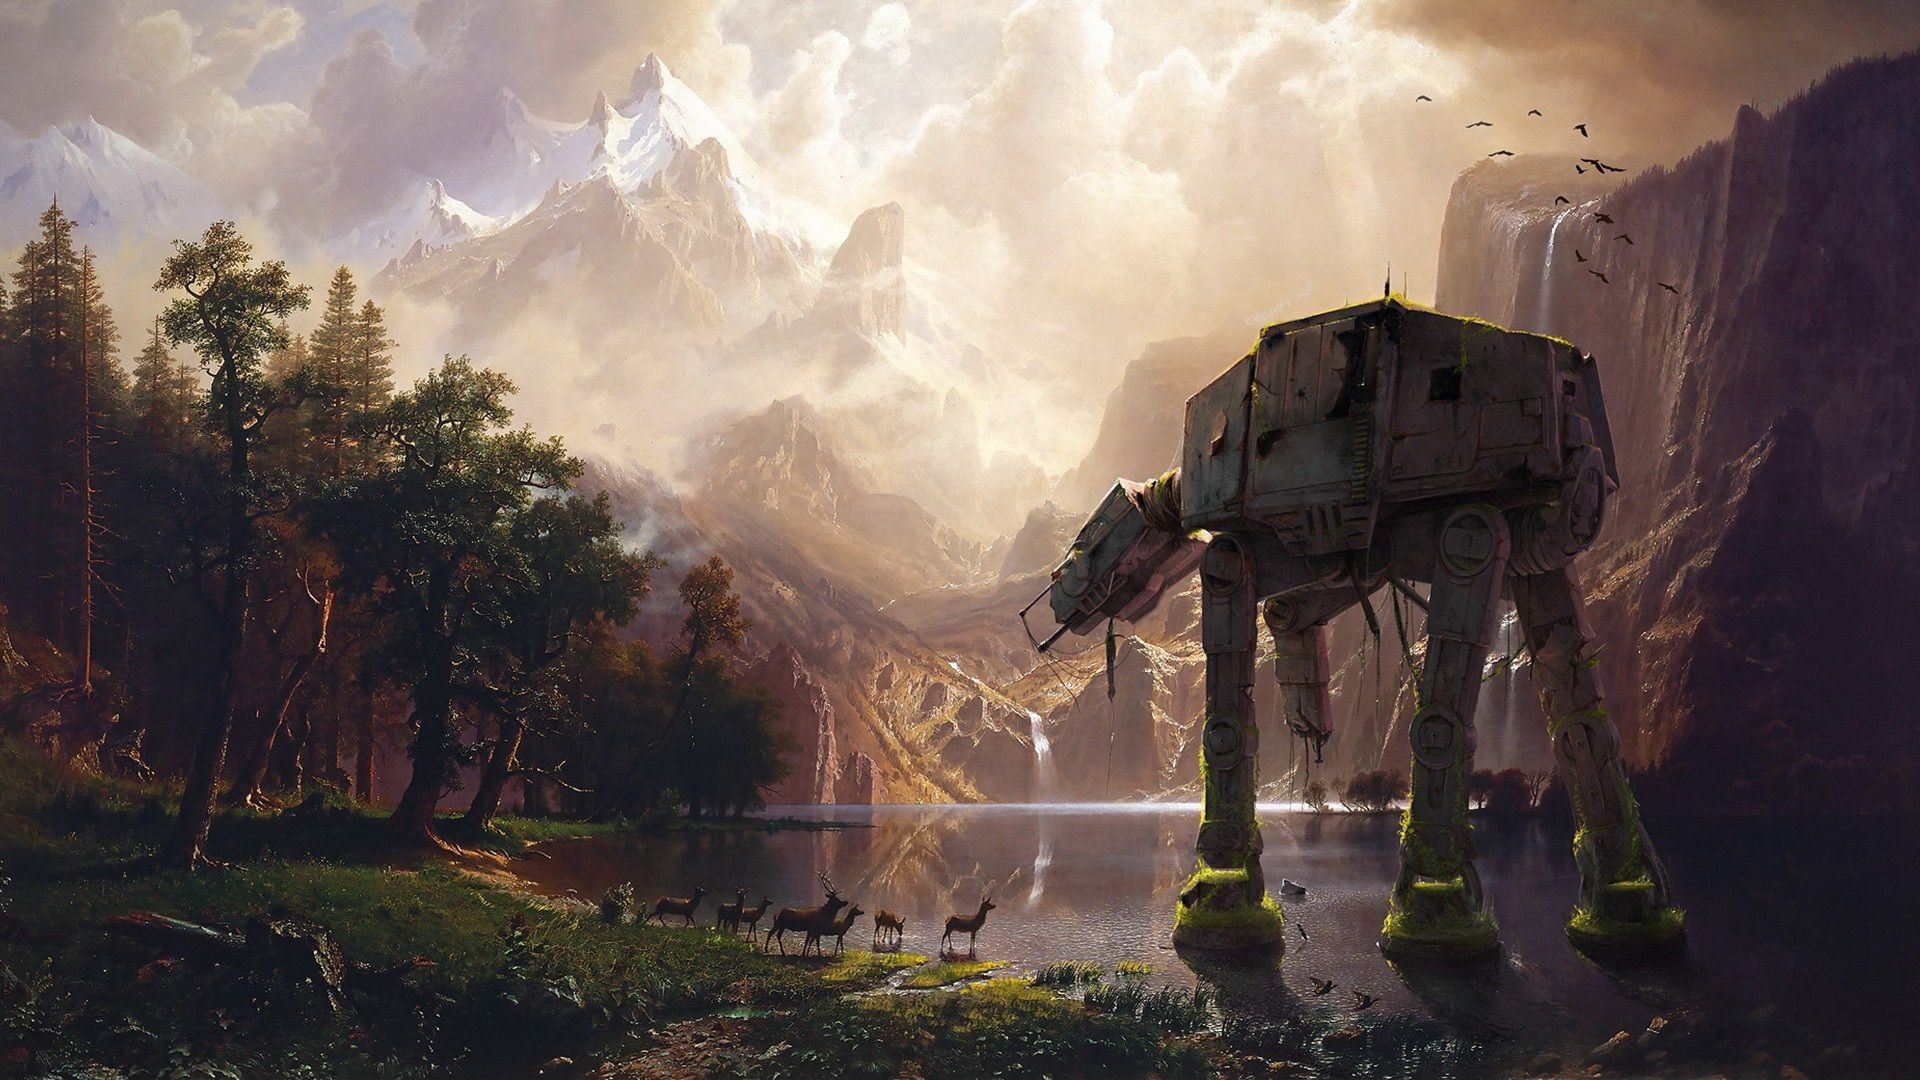 72e6904b Bd6b 4137 B536 1c06f8829924 - Star Wars Wallpaper Art , HD Wallpaper & Backgrounds